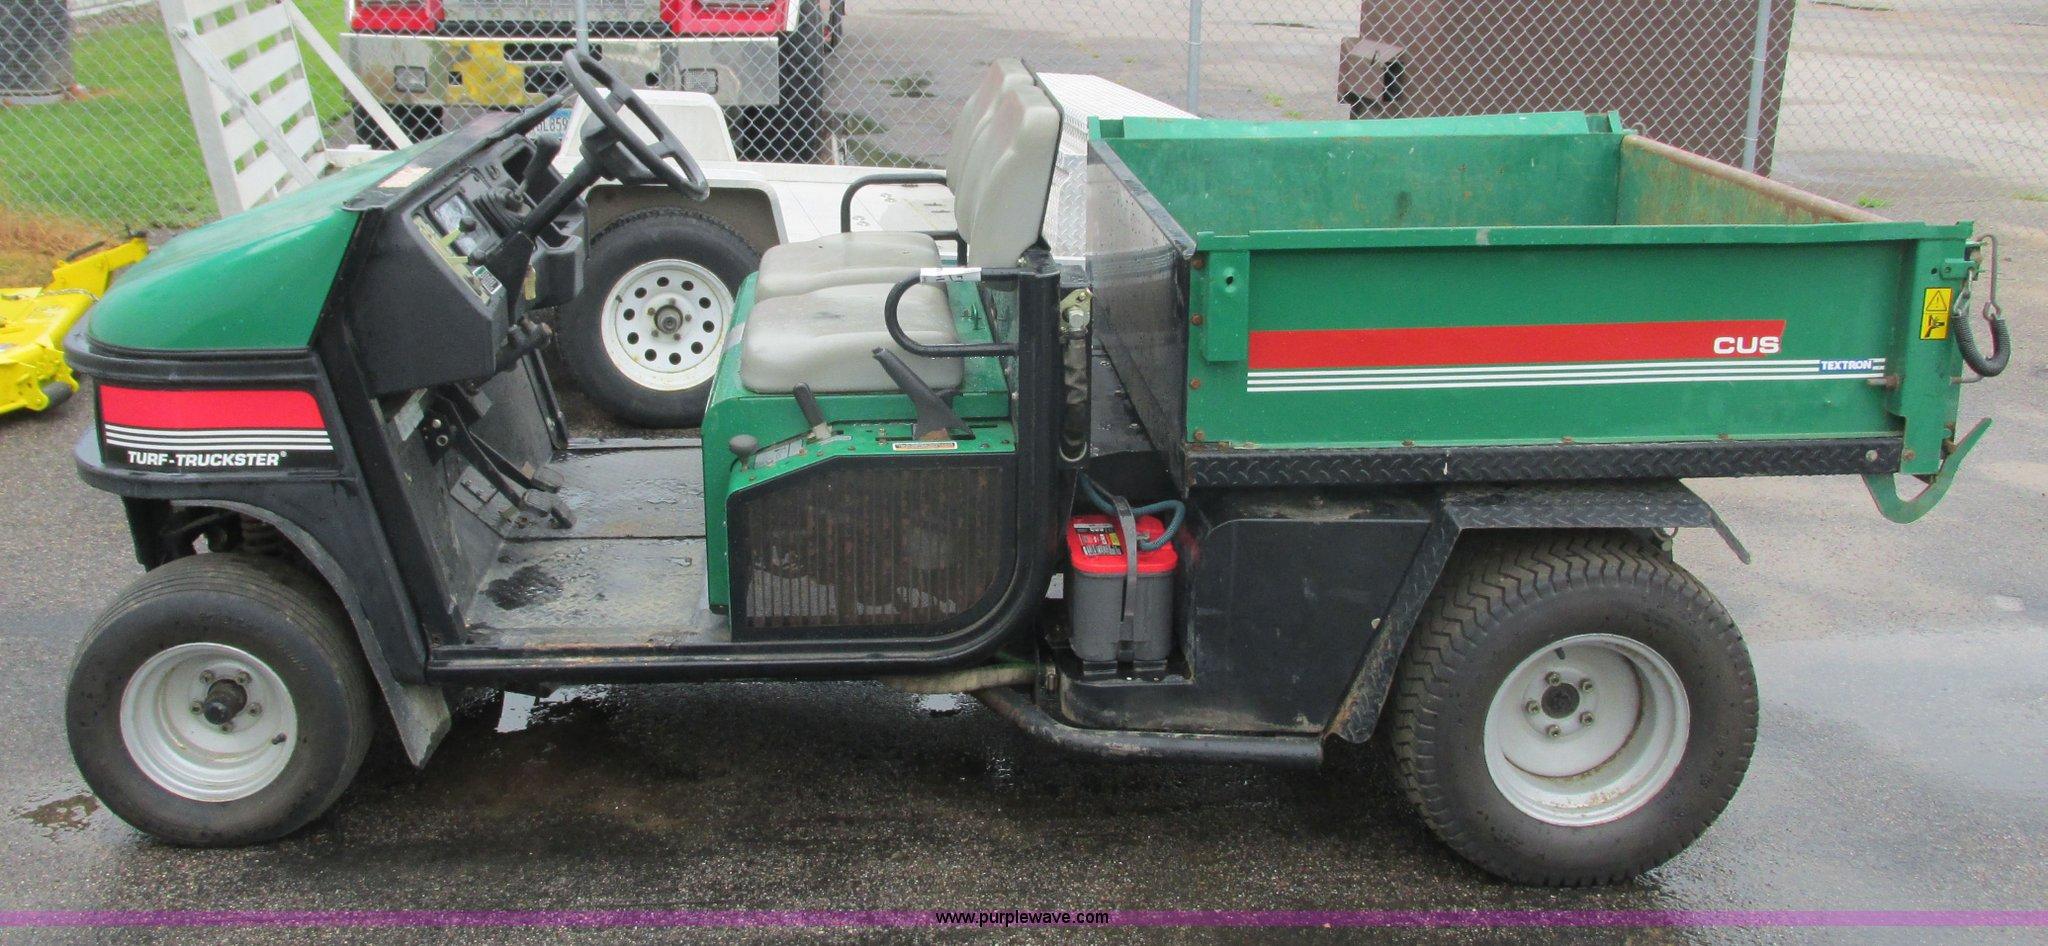 Cushman Hawk Wiring Diagram Turf Truckster Utility Vehicle Item 2048x946